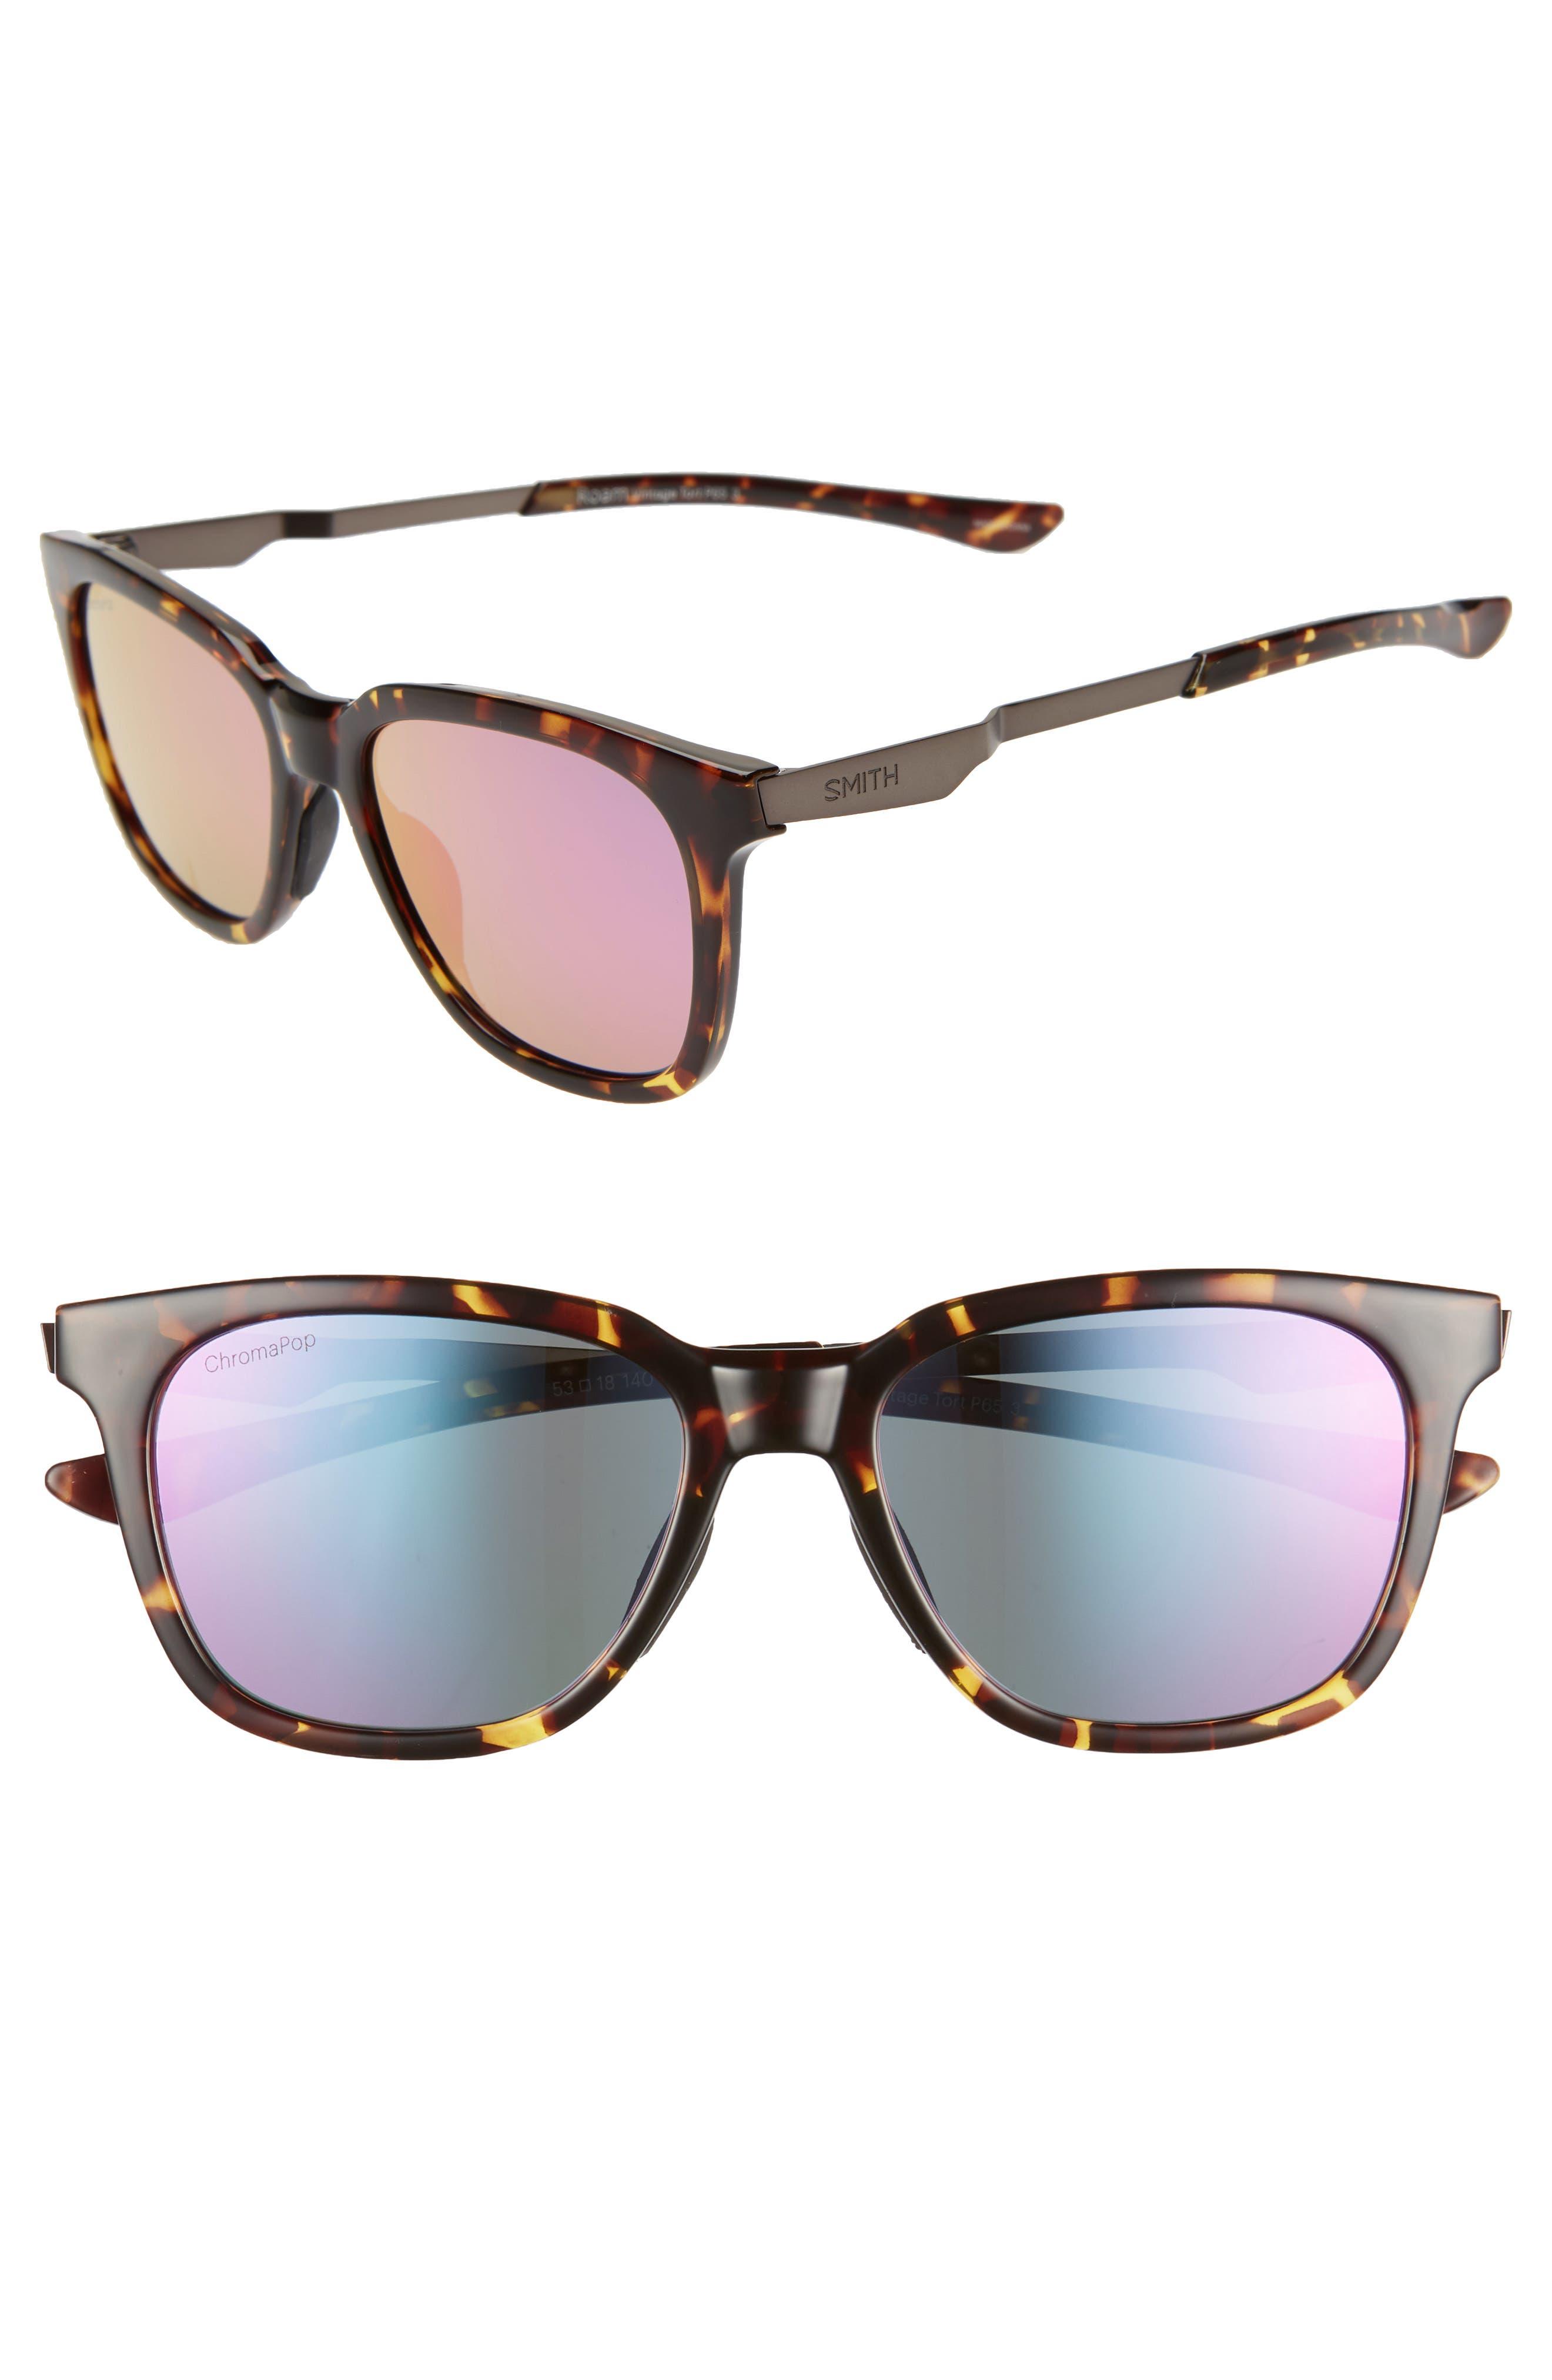 3eaa223065 Smith sunglasses nordstrom jpg 480x730 Comeback chromapop